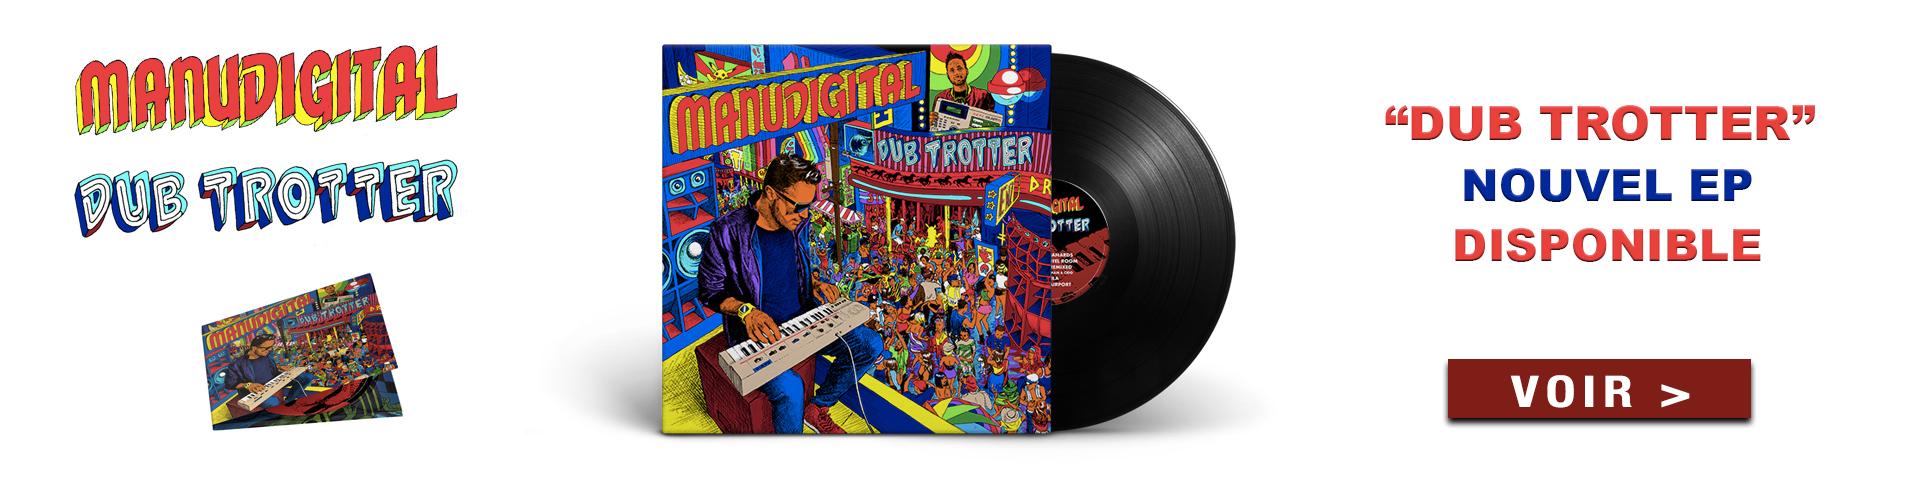 Manudigital-Dub-Trotter-EP disponible